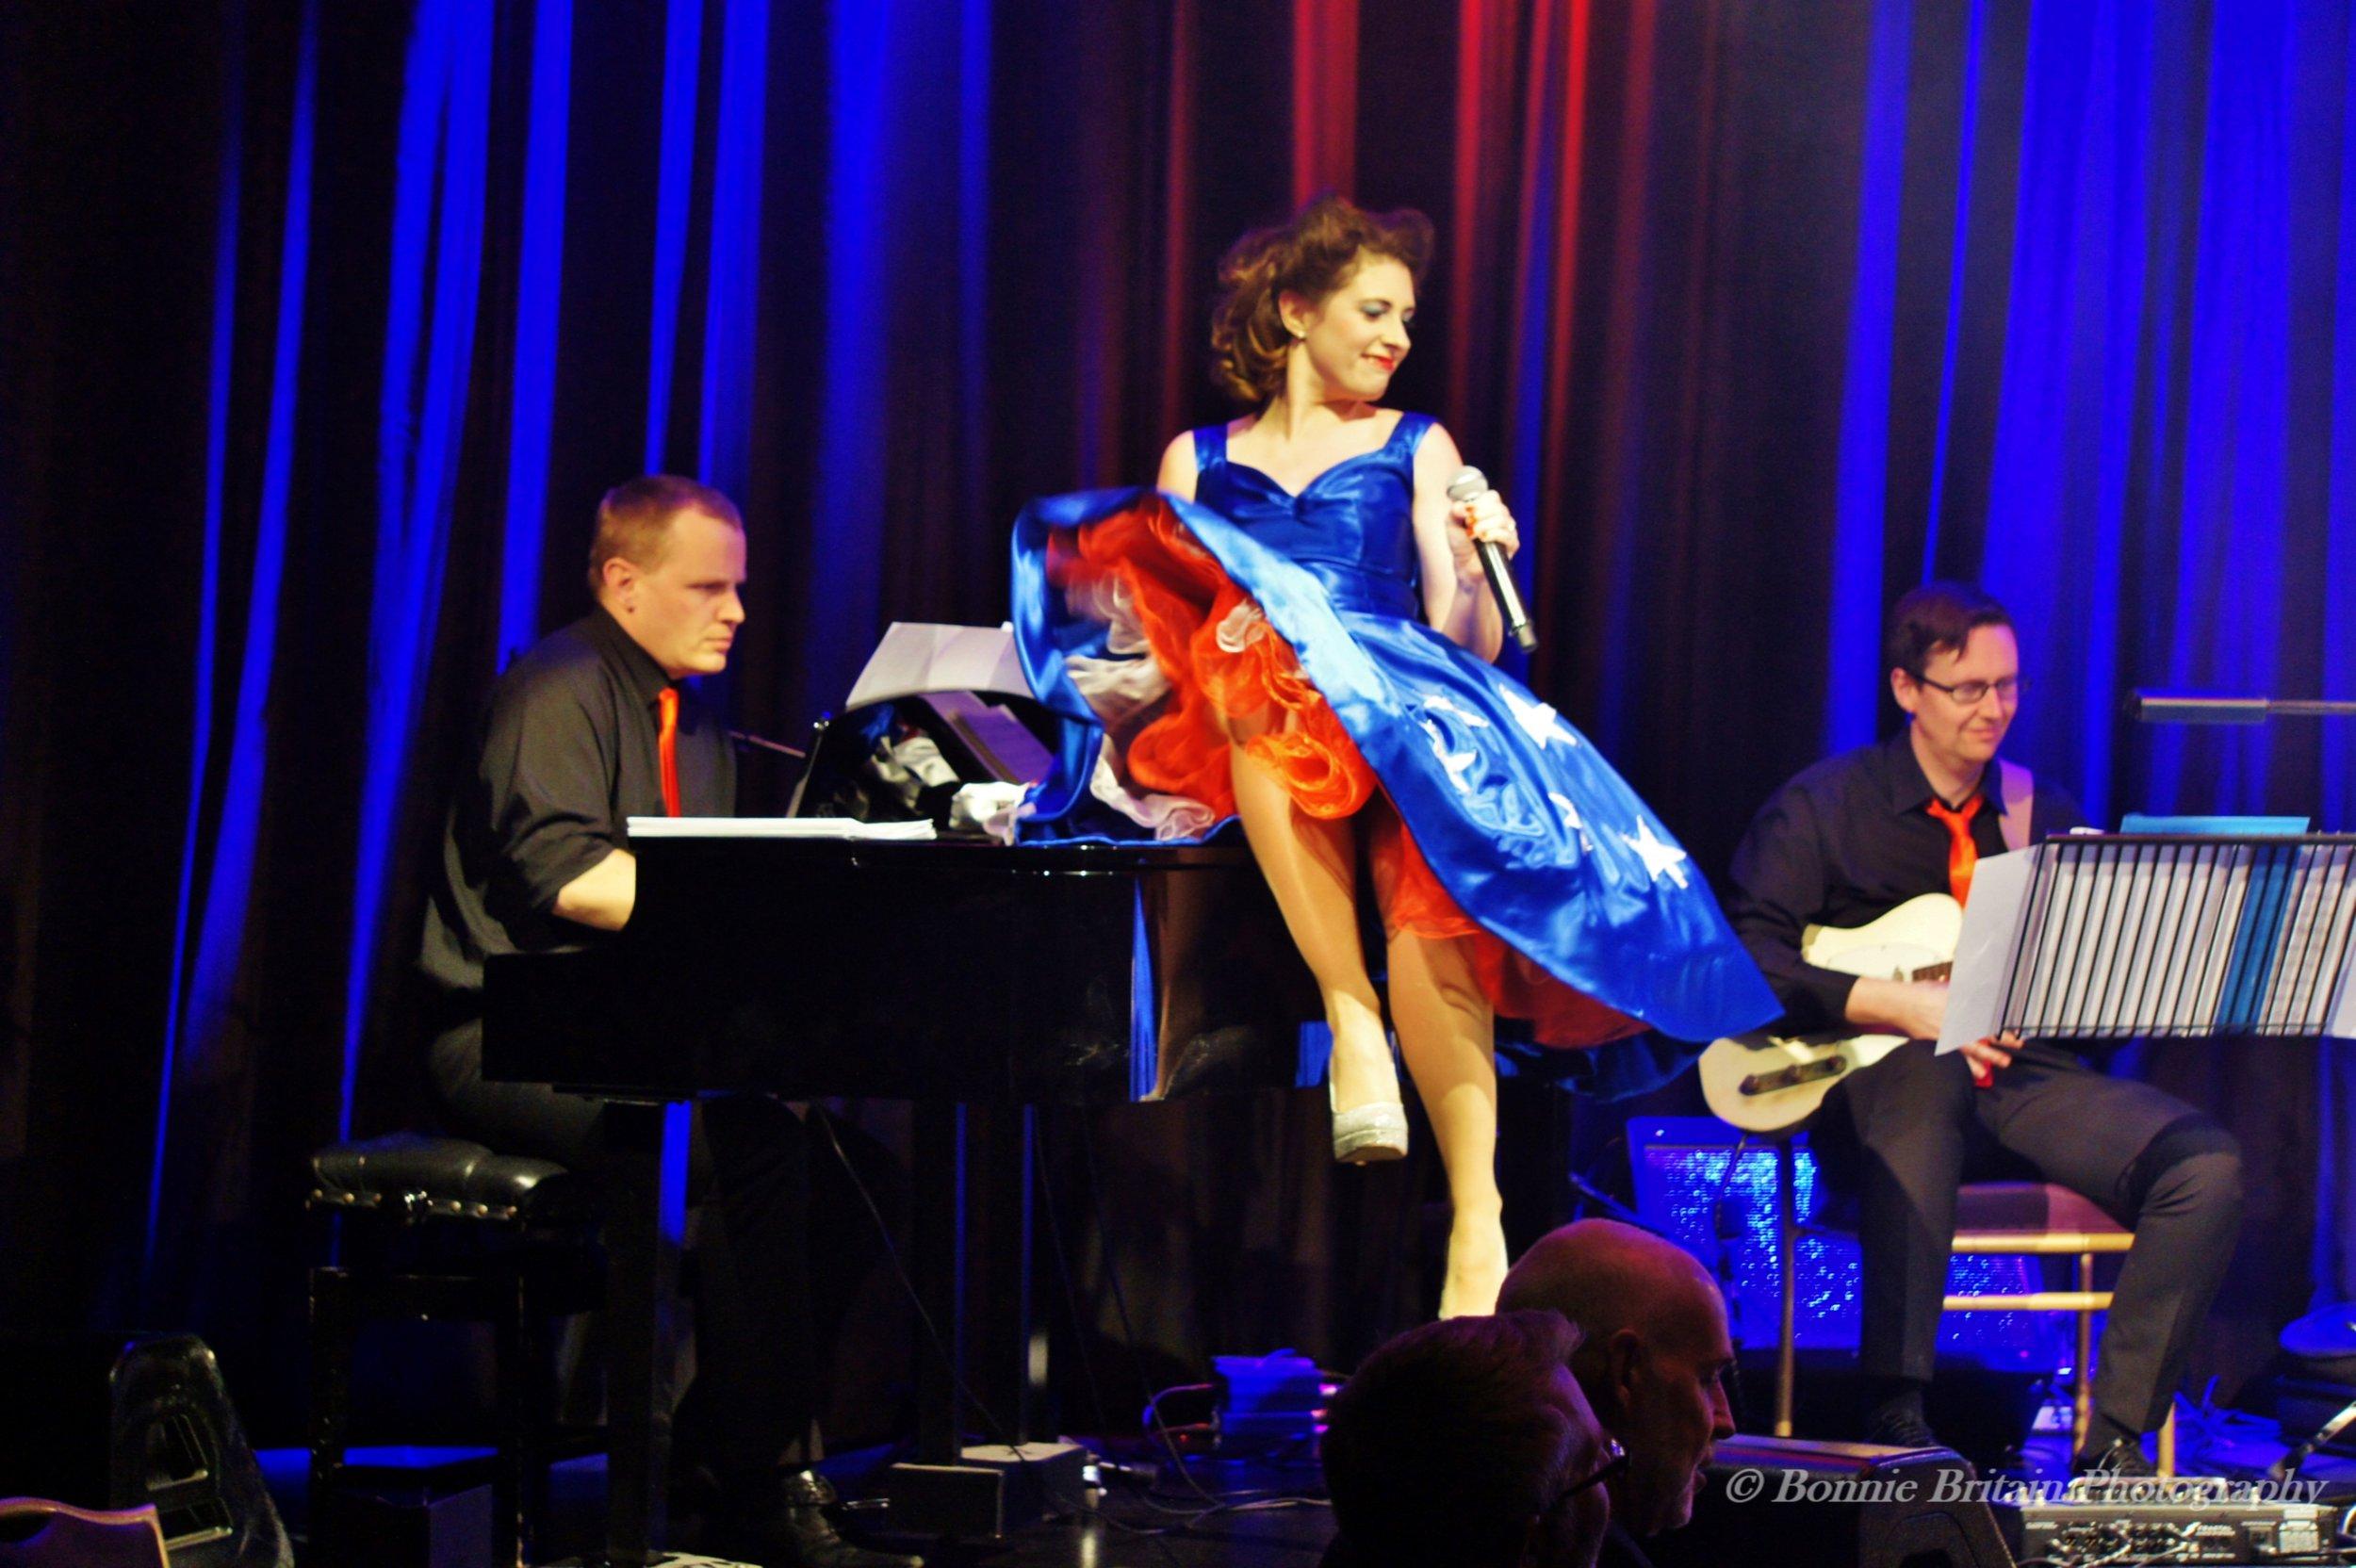 Ashleigh at Live at the Hippodrome  Photo credit: Bonnie Britain